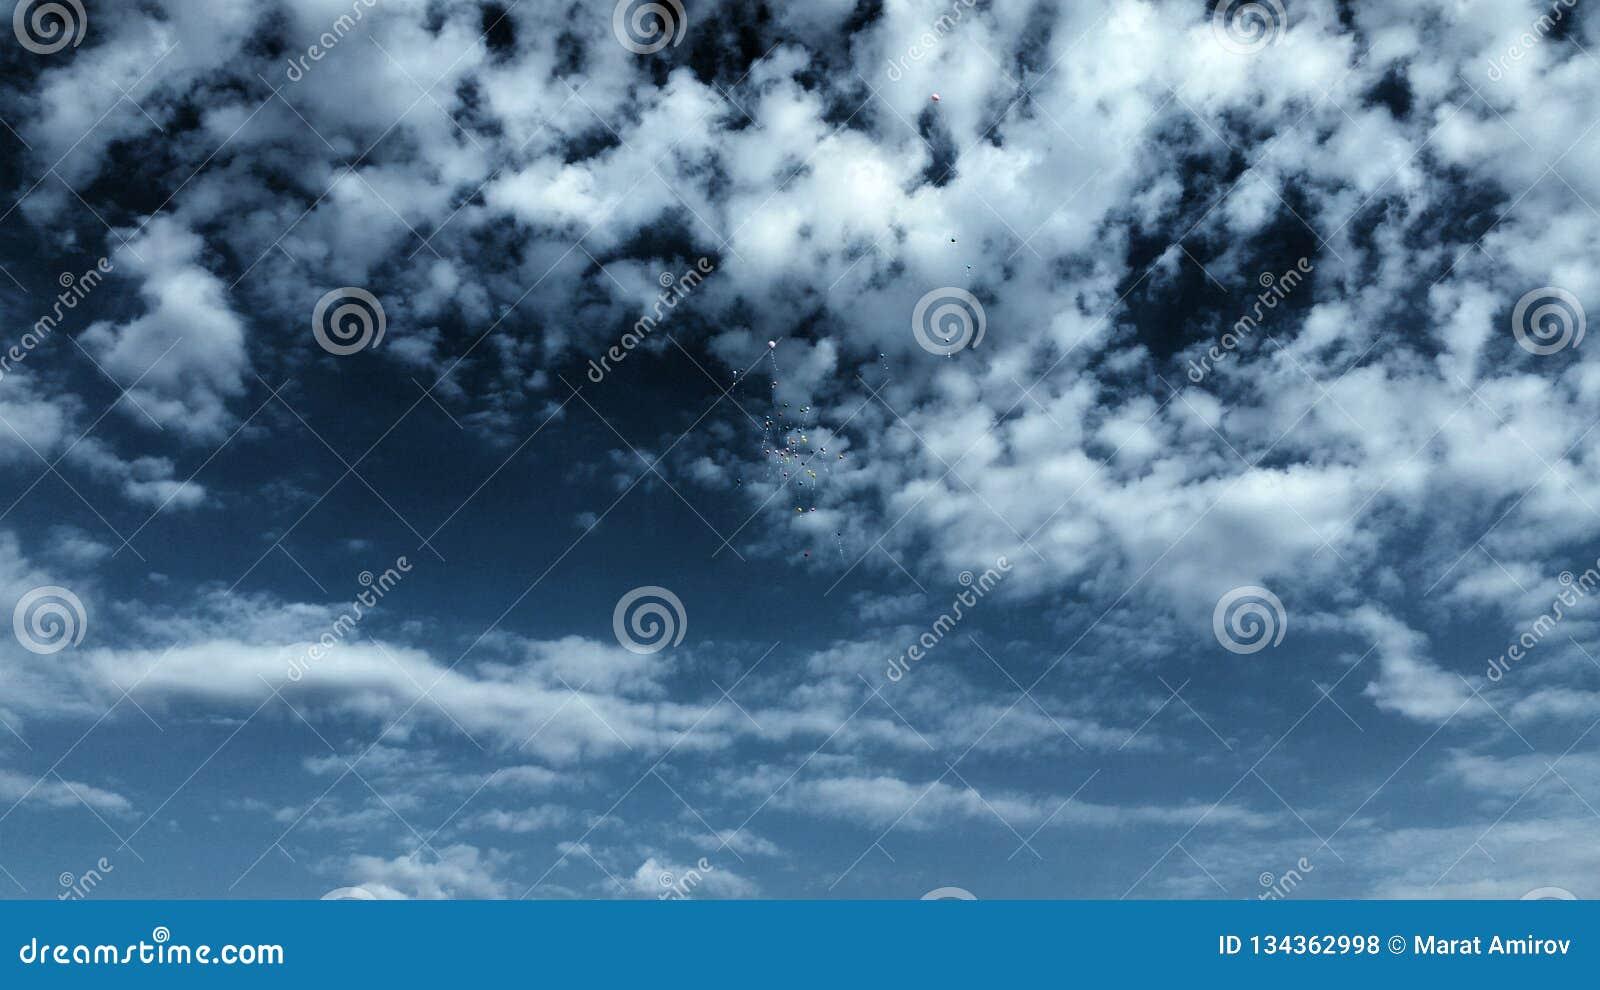 Blue sky and clouds scene